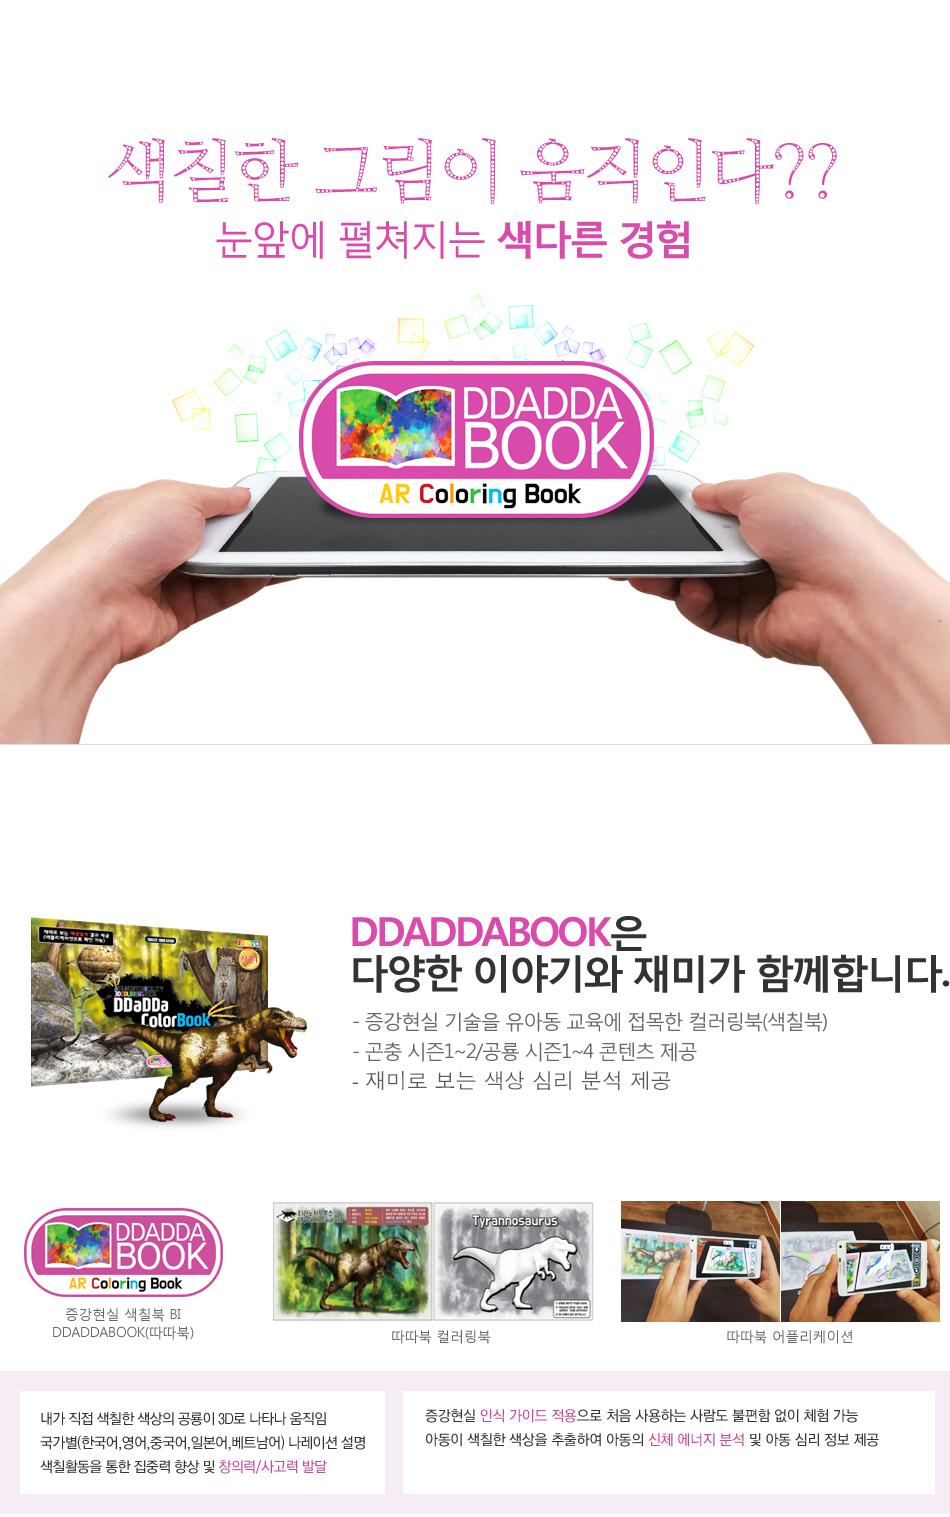 AR 증강현실 컬러링북 주니어 공룡 색칠북 시즌1 - 따따북, 11,000원, 미술놀이, 미술교구